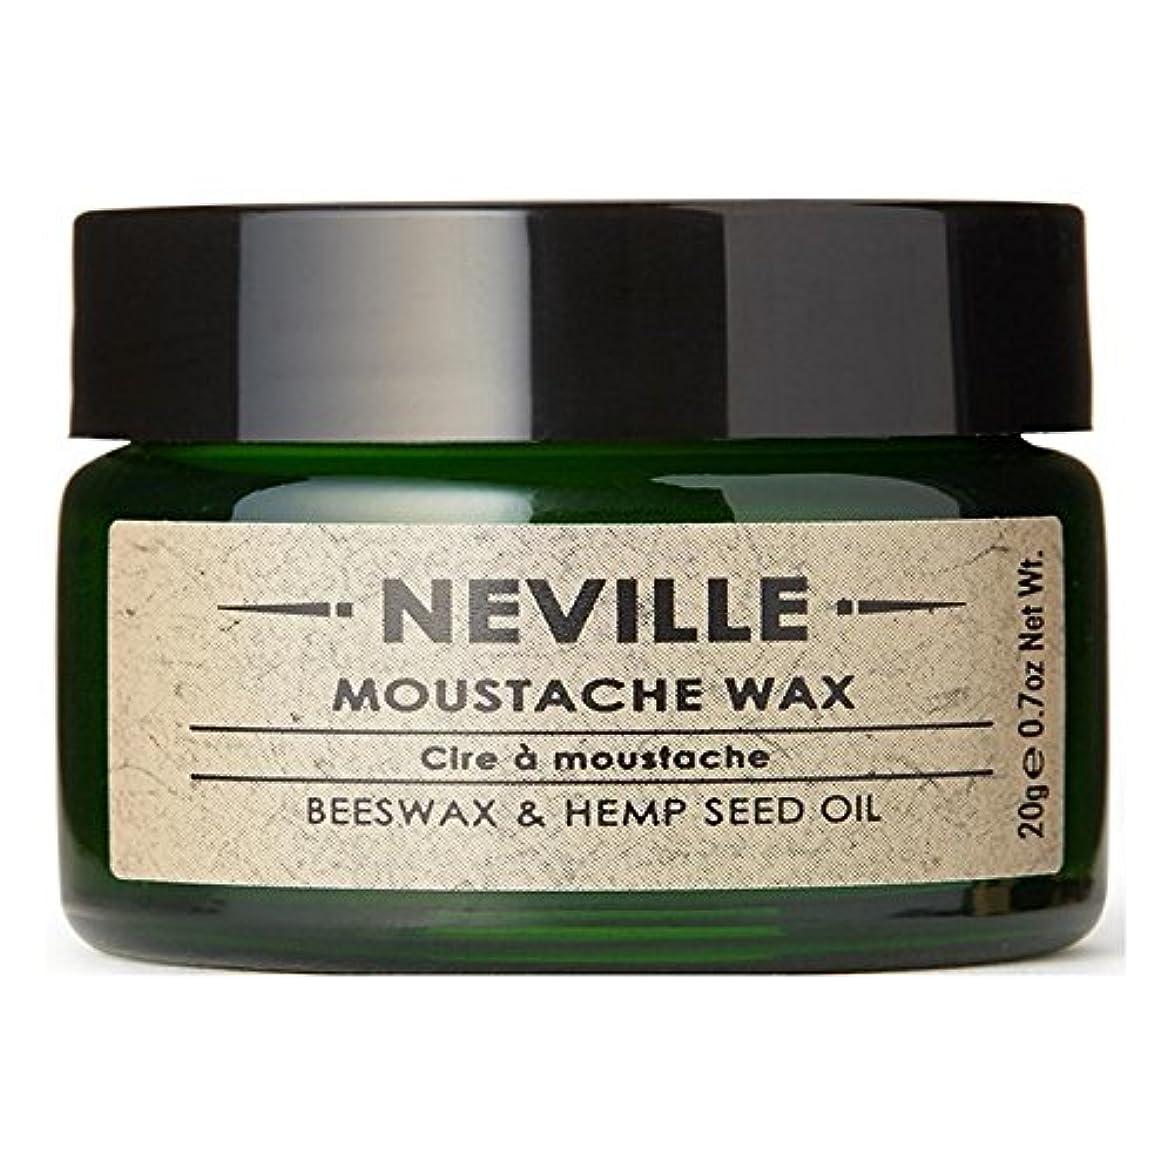 Neville Moustache Wax - ネビル口ひげワックス [並行輸入品]